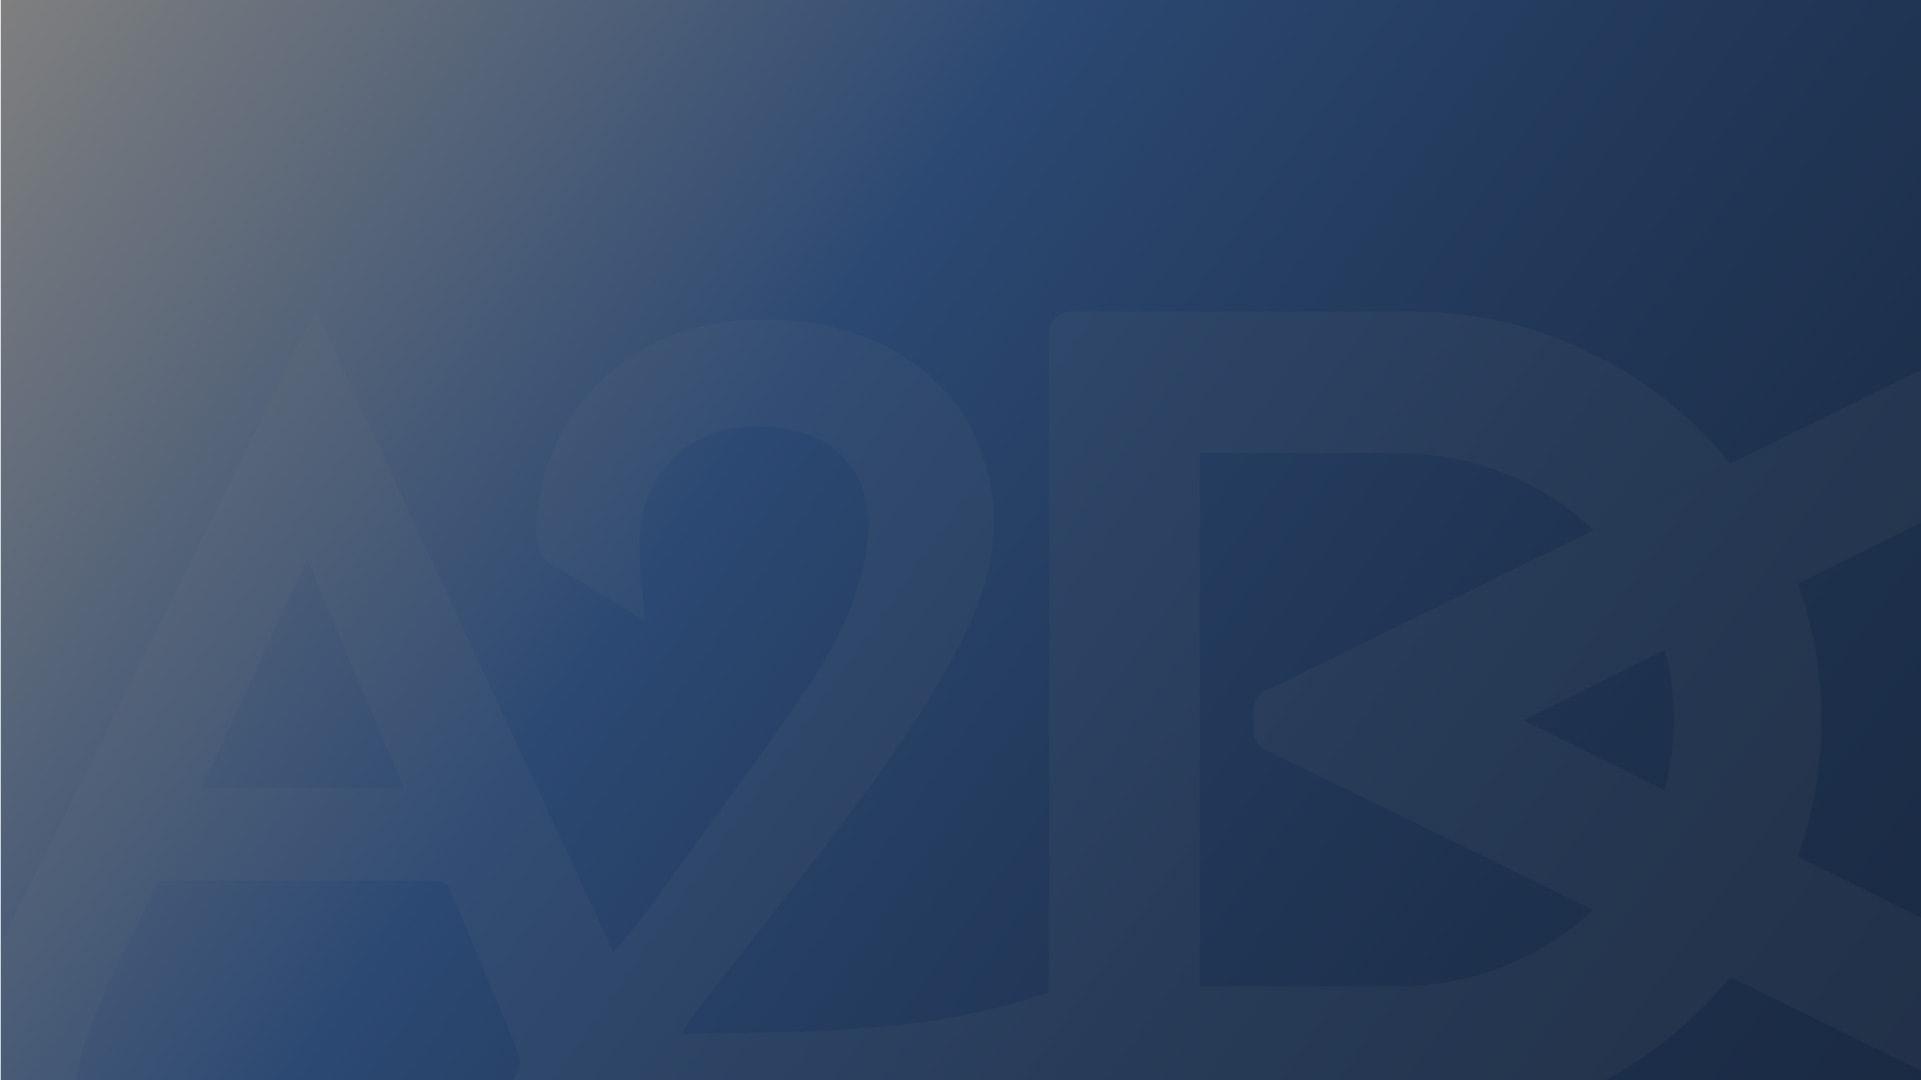 Ascend2: Marketing Technology ROI Study